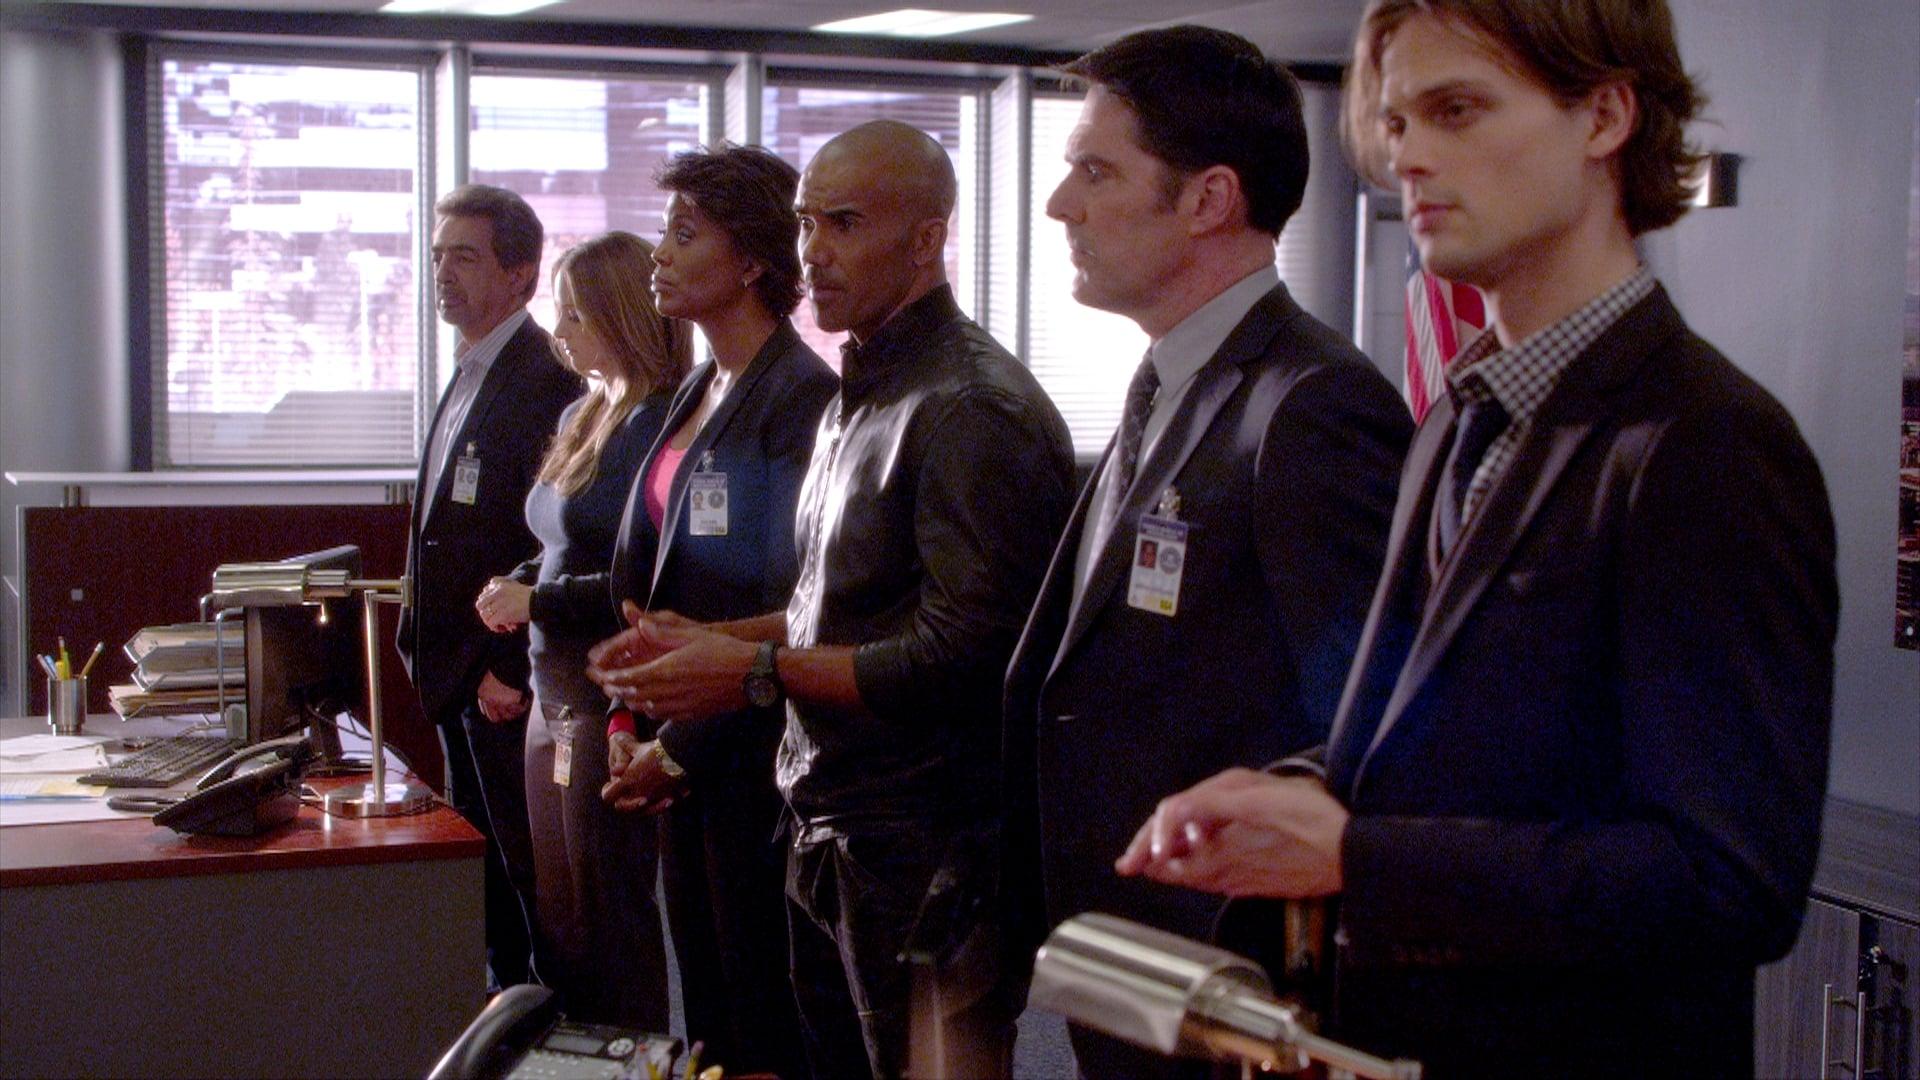 Criminal Minds - Season 11 Episode 13 : The Bond